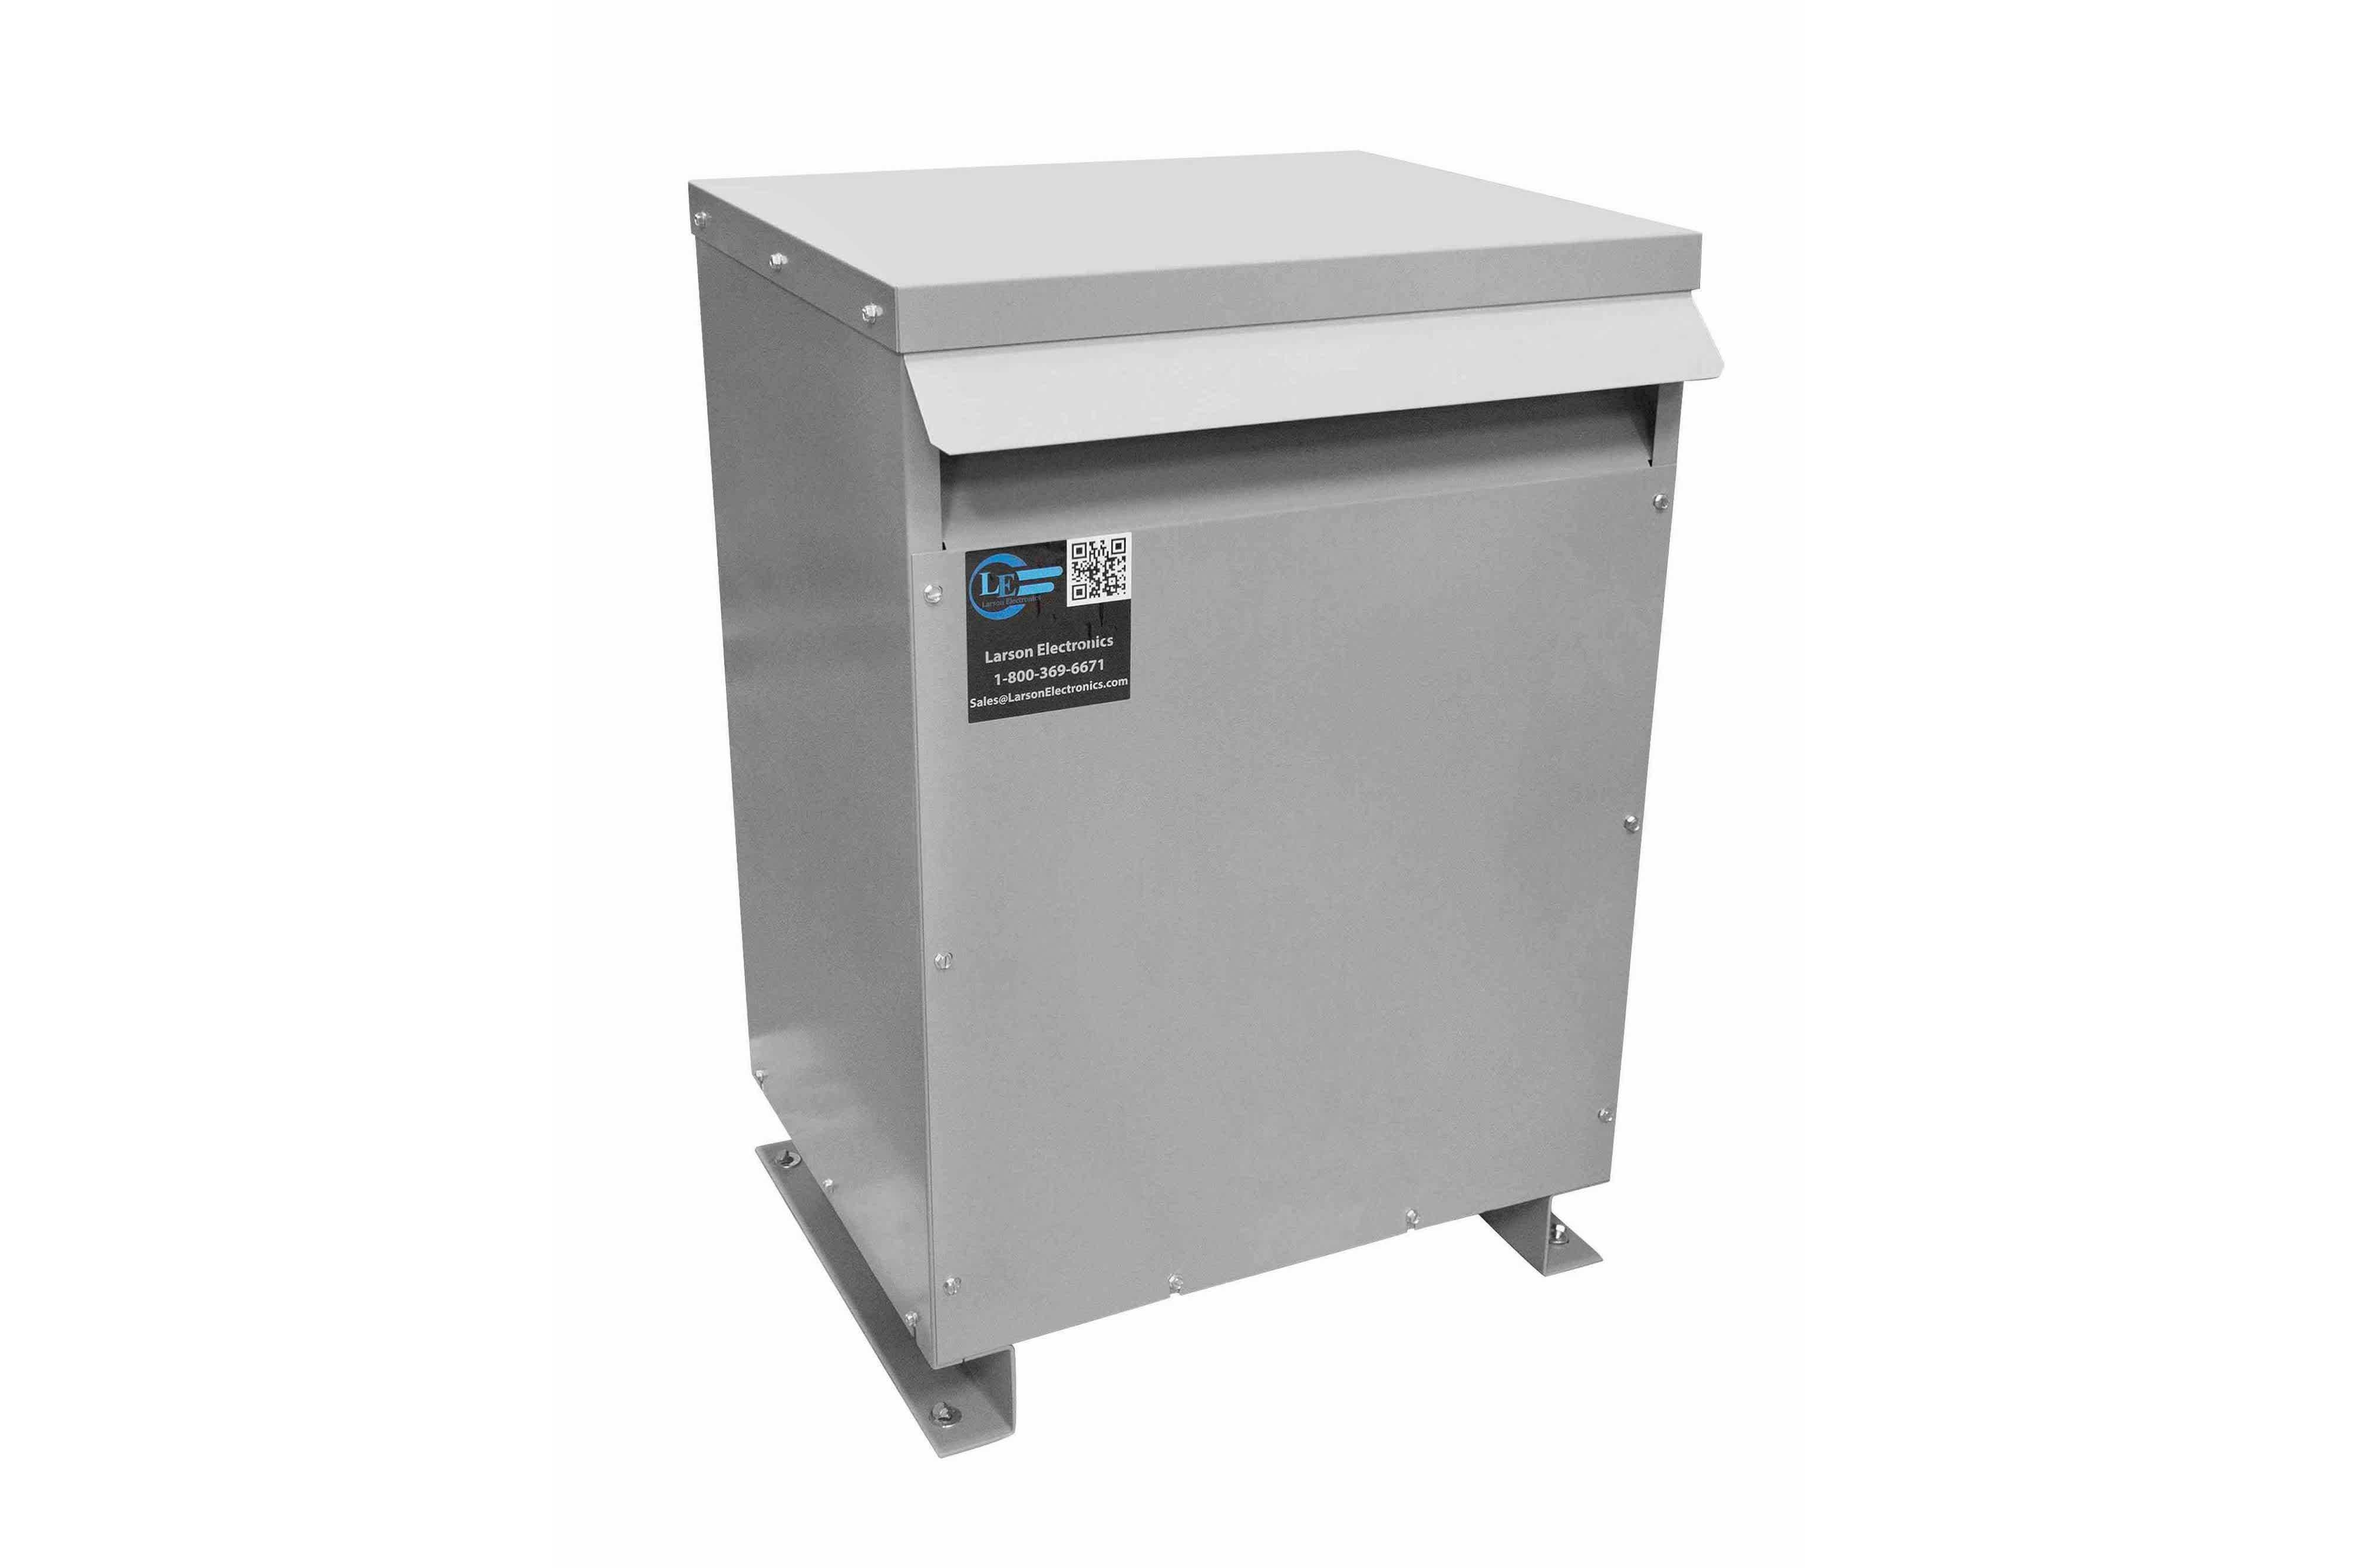 11 kVA 3PH Isolation Transformer, 575V Wye Primary, 240V Delta Secondary, N3R, Ventilated, 60 Hz